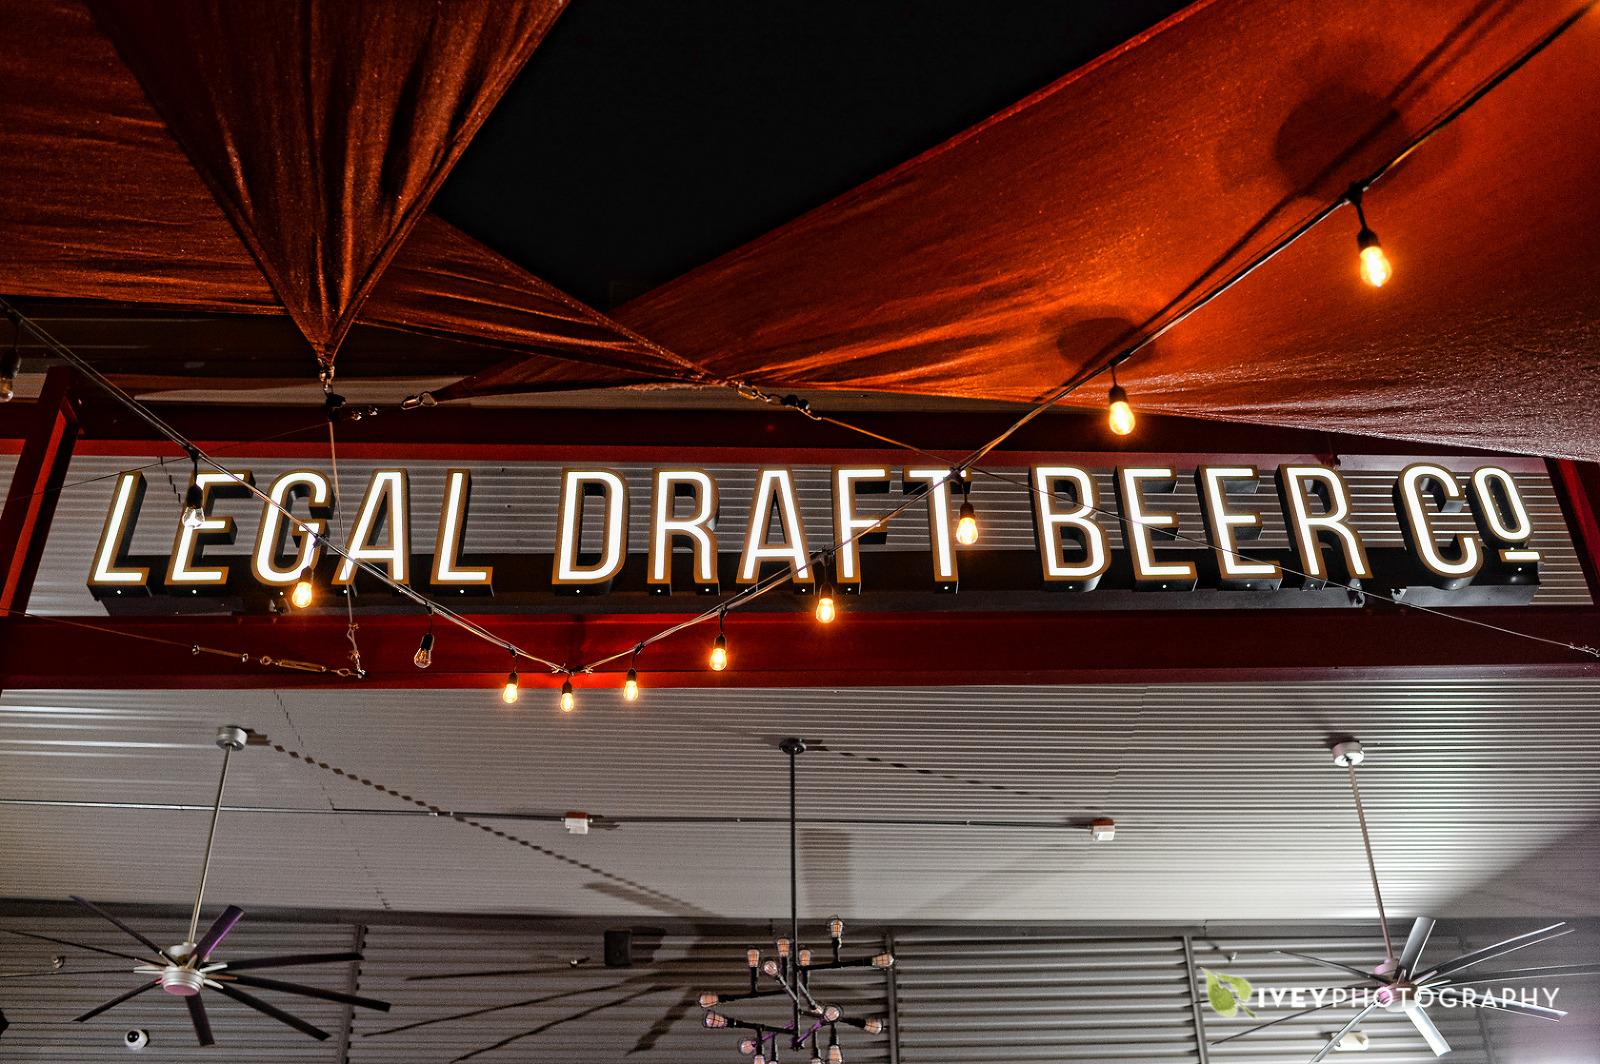 Arlington Wedding Photography Legal Draft Beer Co